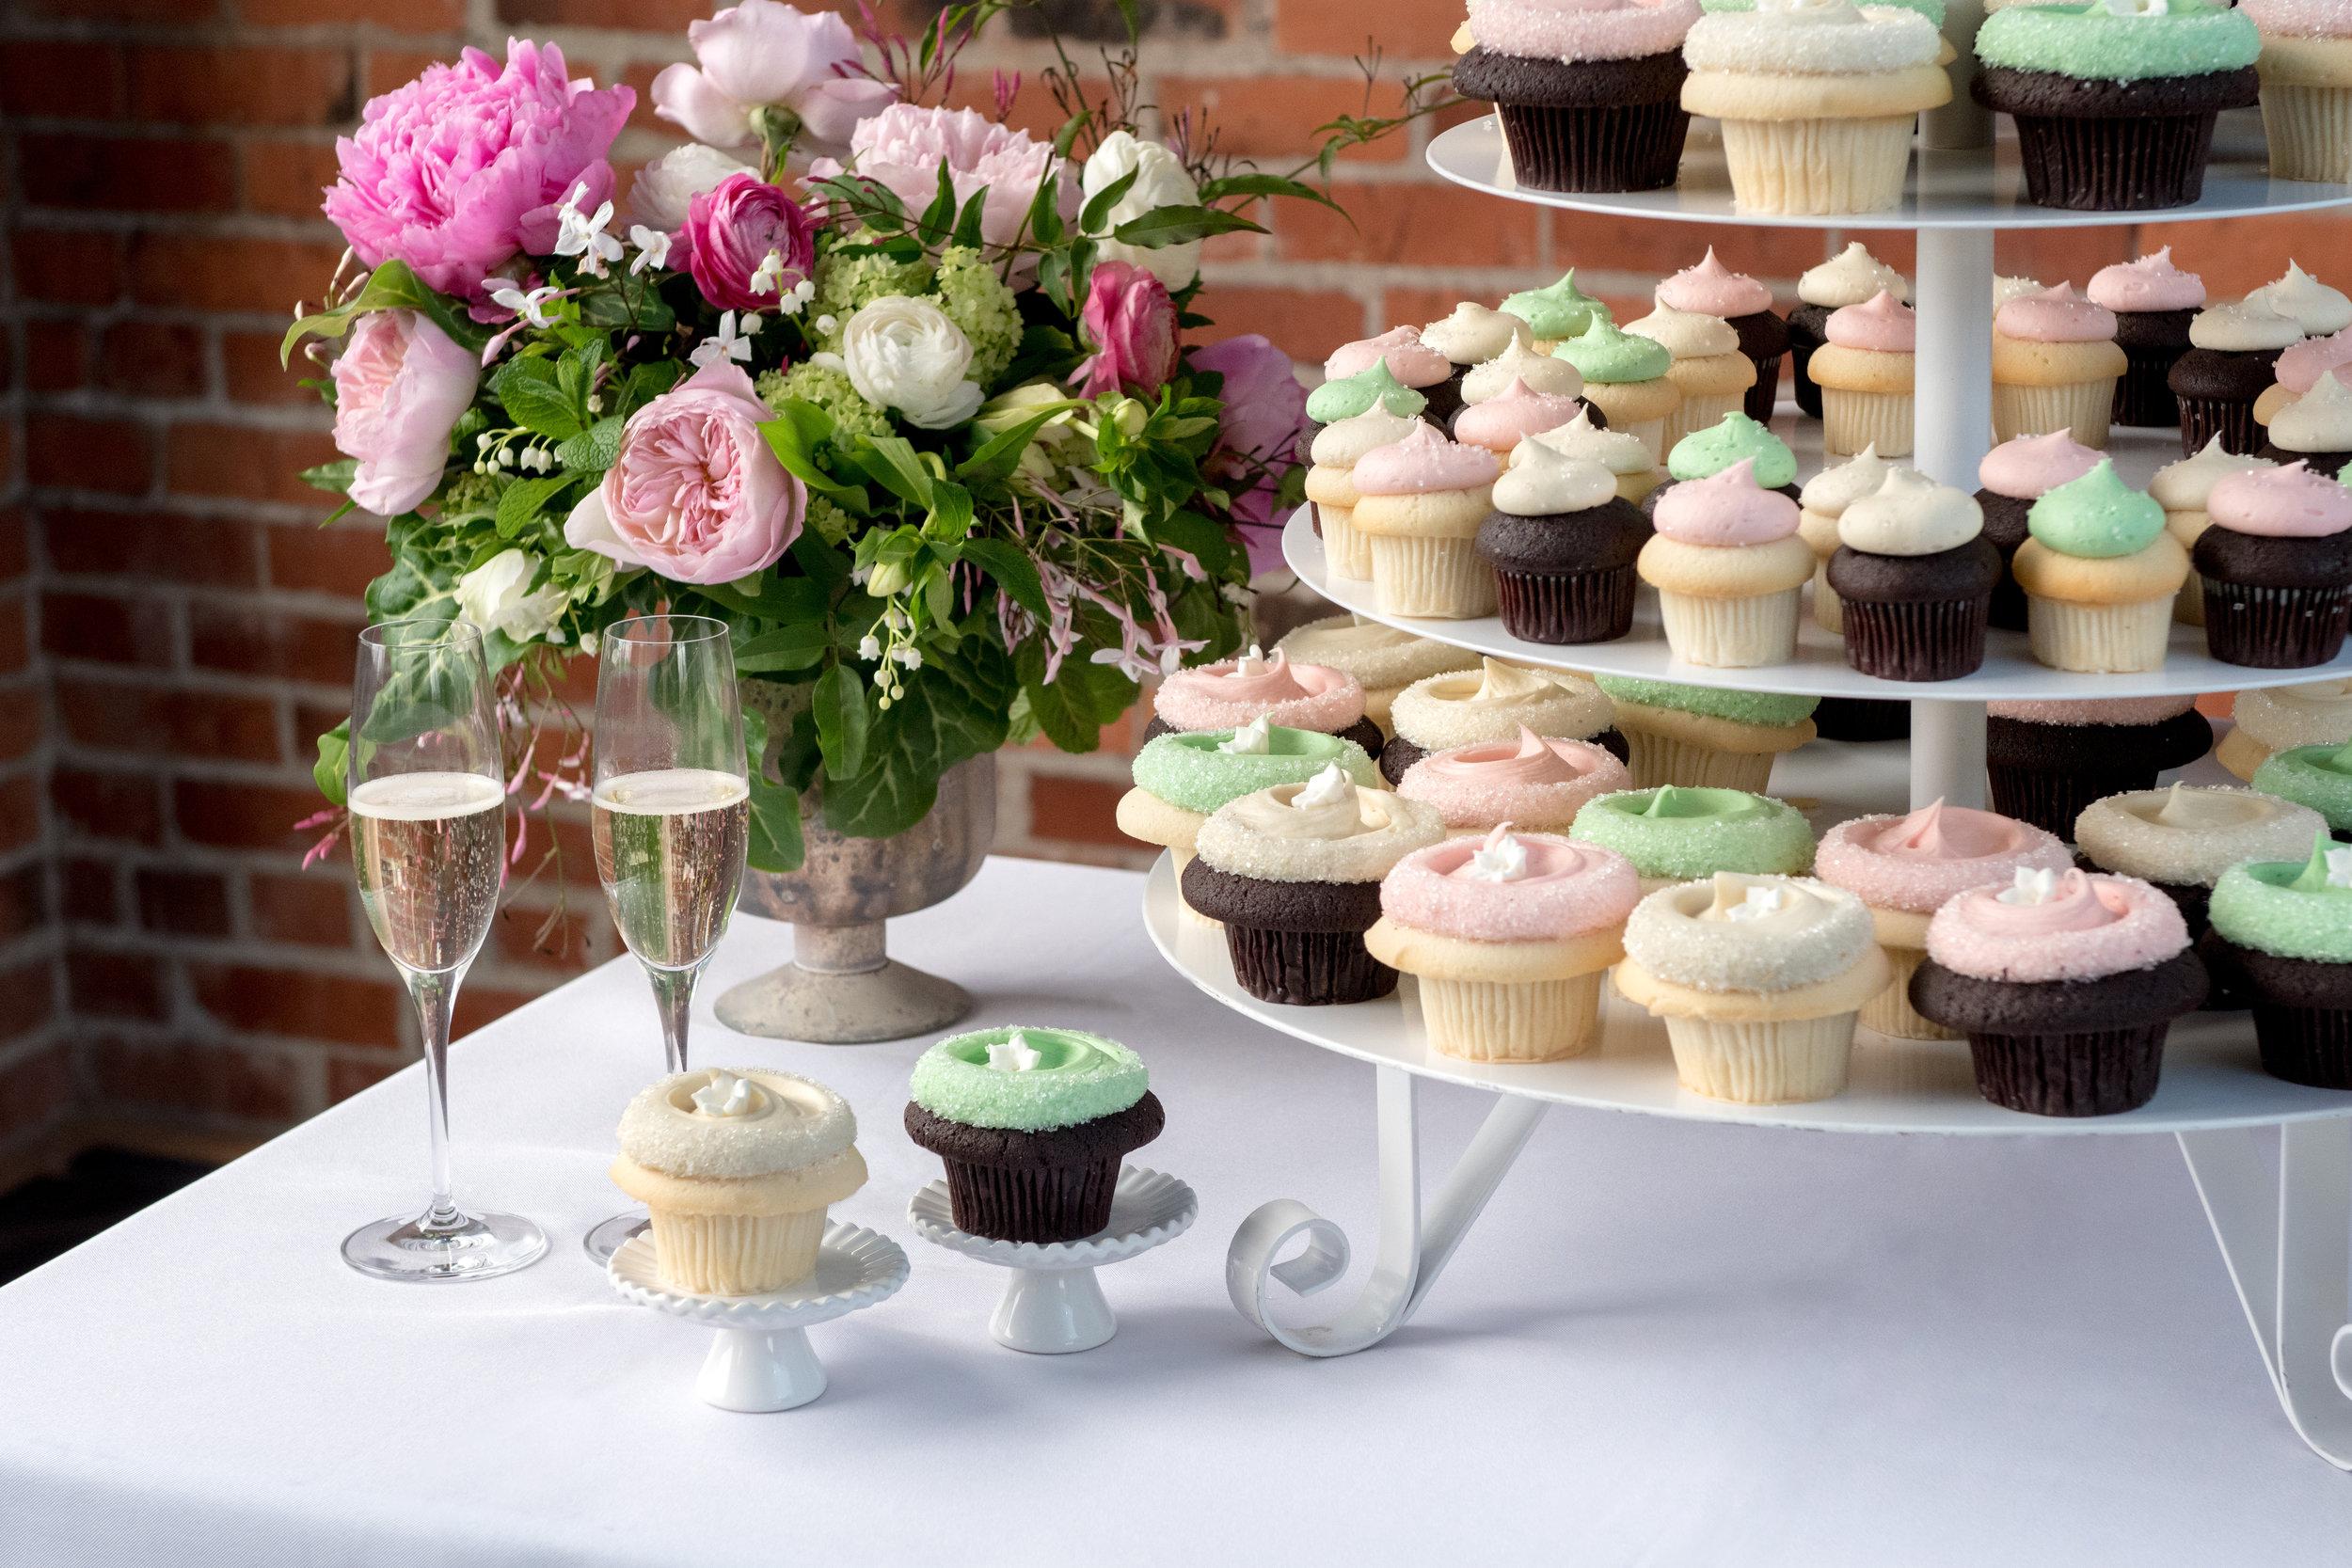 20180327-Wedding Cupcakes-071.jpg